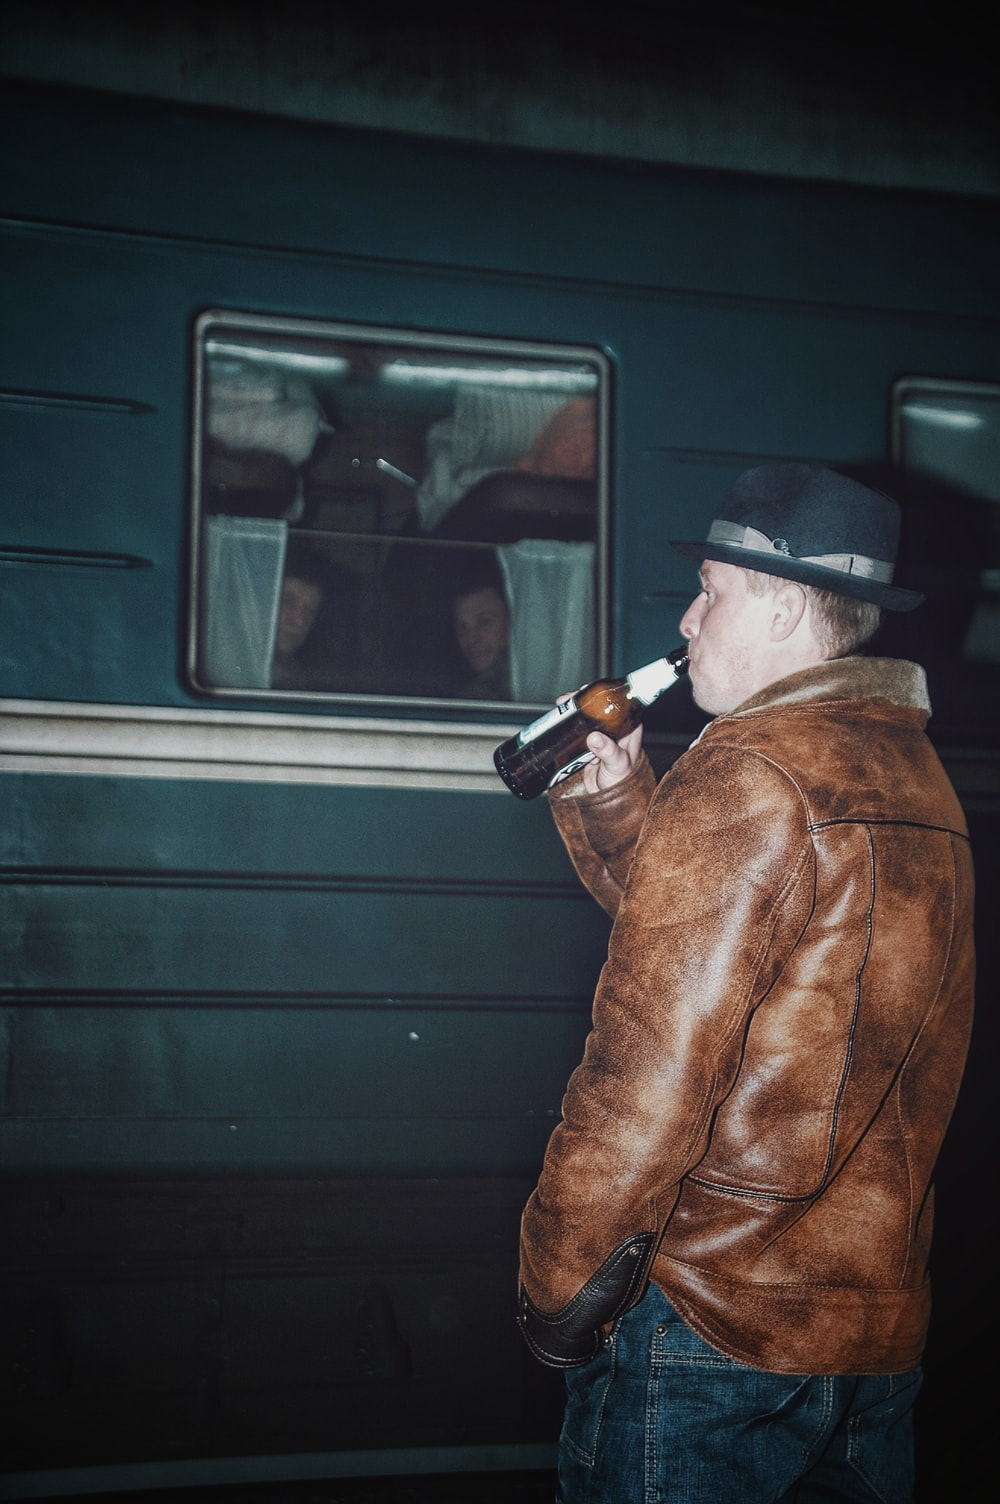 man wearing brown leather jacket drinking beer